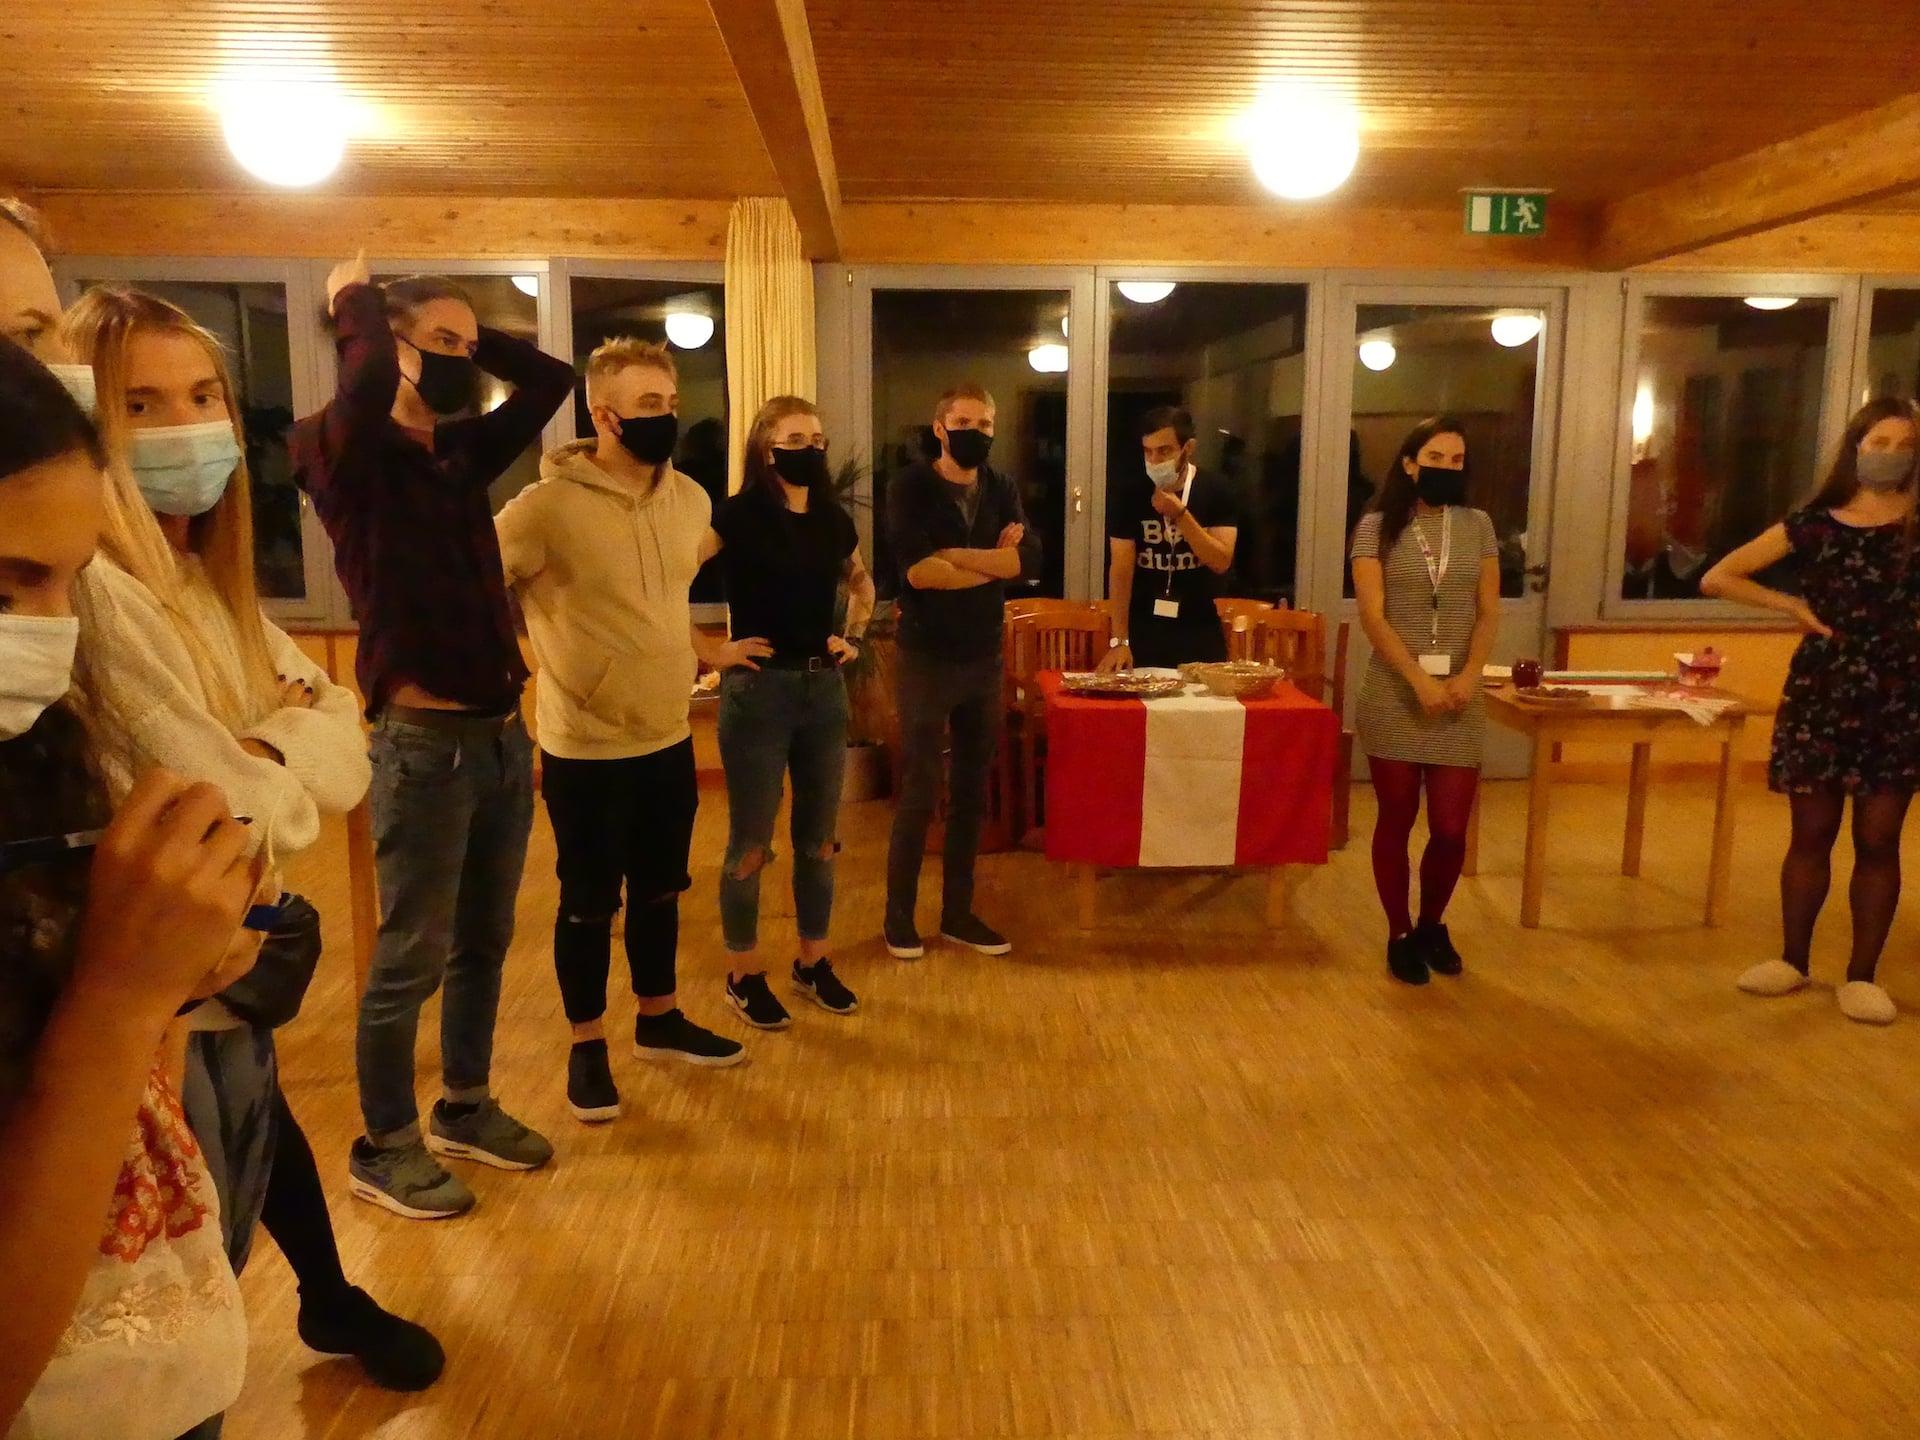 koolitus training course nyh austria transformation europe